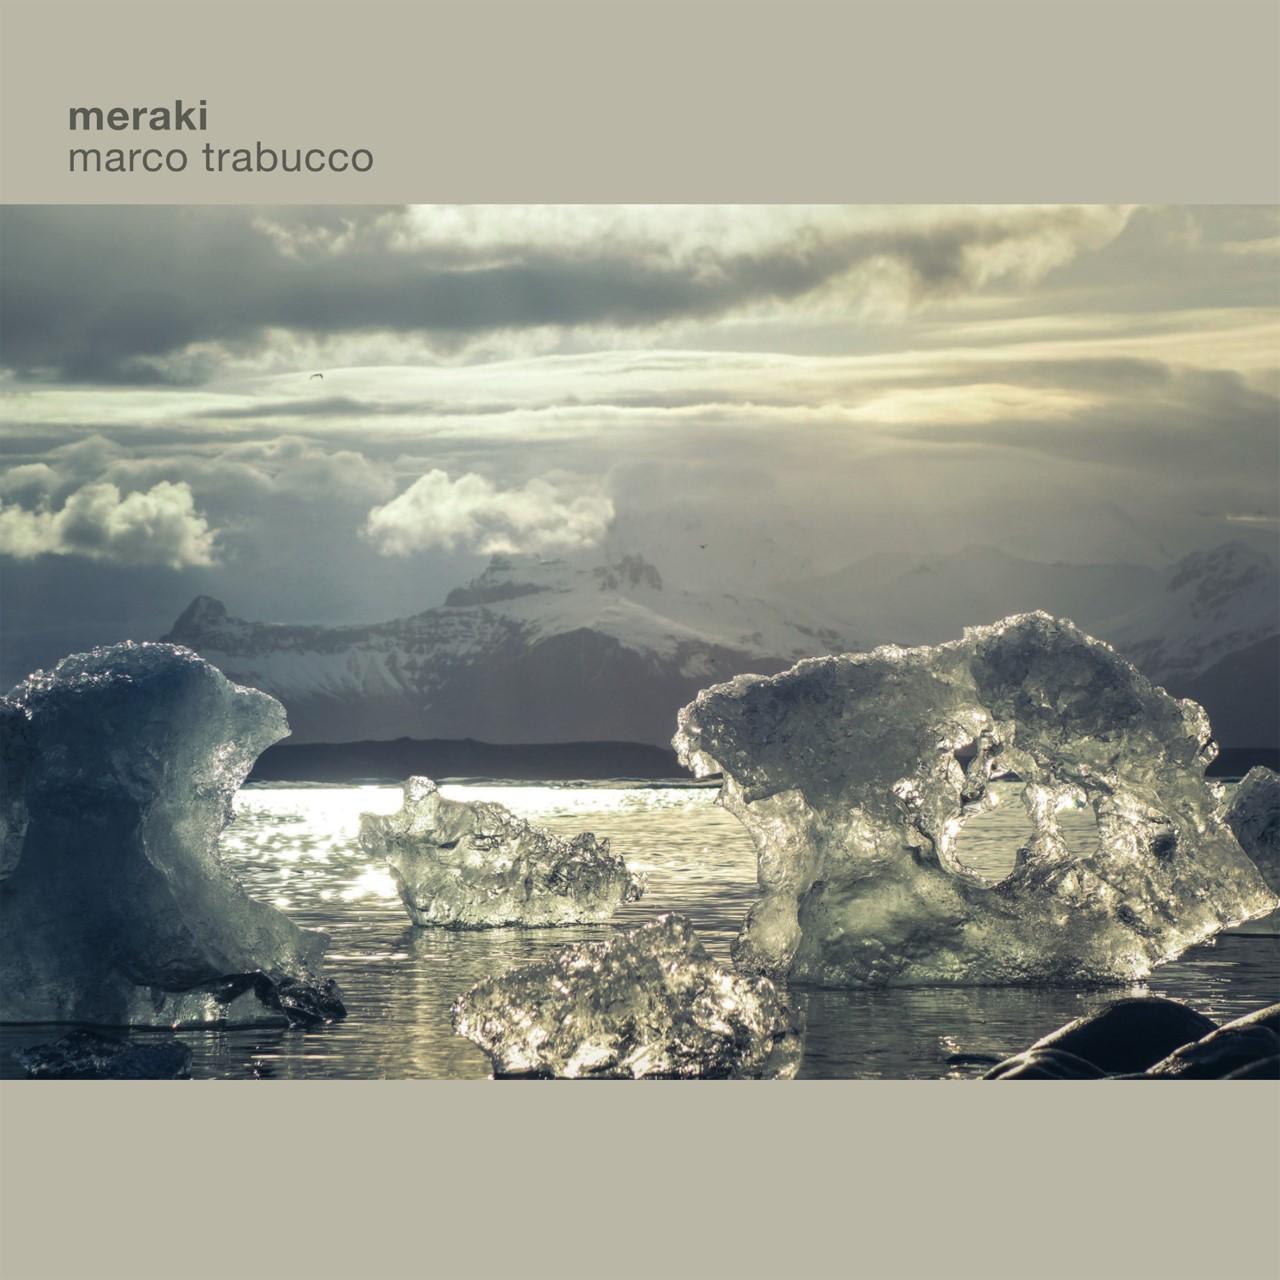 Marco Trabucco<br/>Meraki<br/>Artesuono, 2018